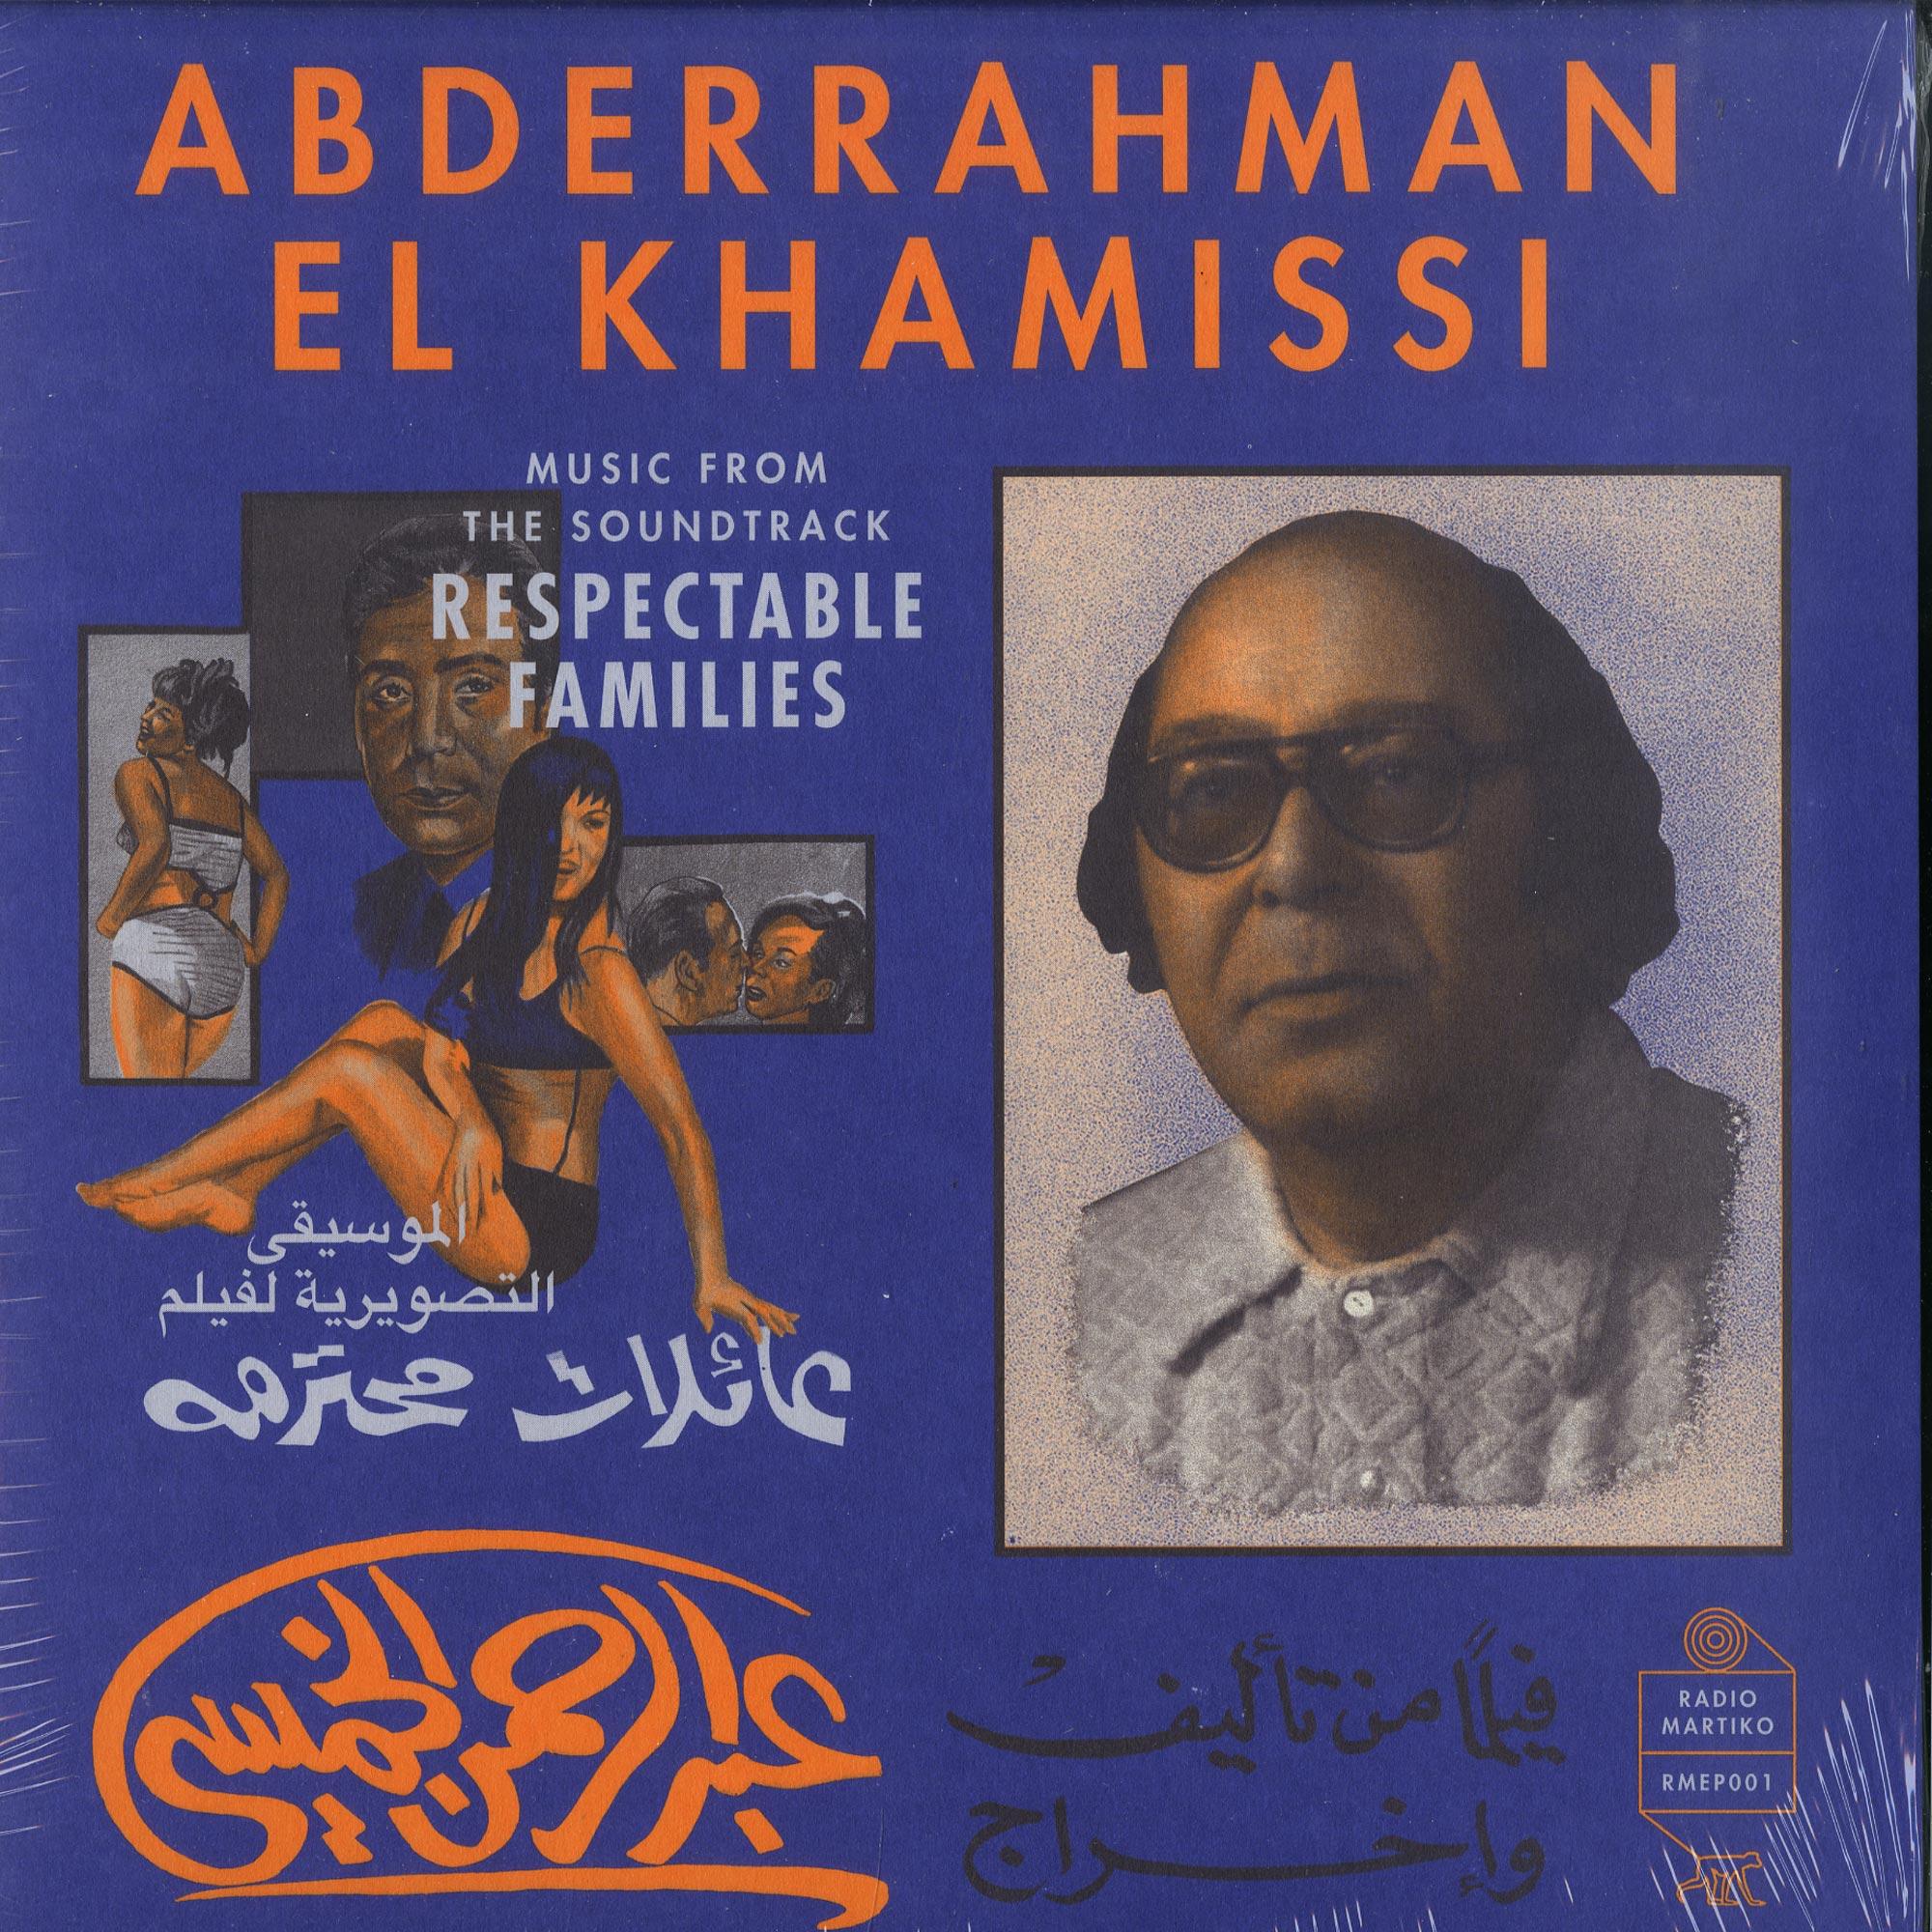 Abderrahman El Khamissi - MUSIC FROM THE SOUNDTRACK RESPECTABLE FAMILIES